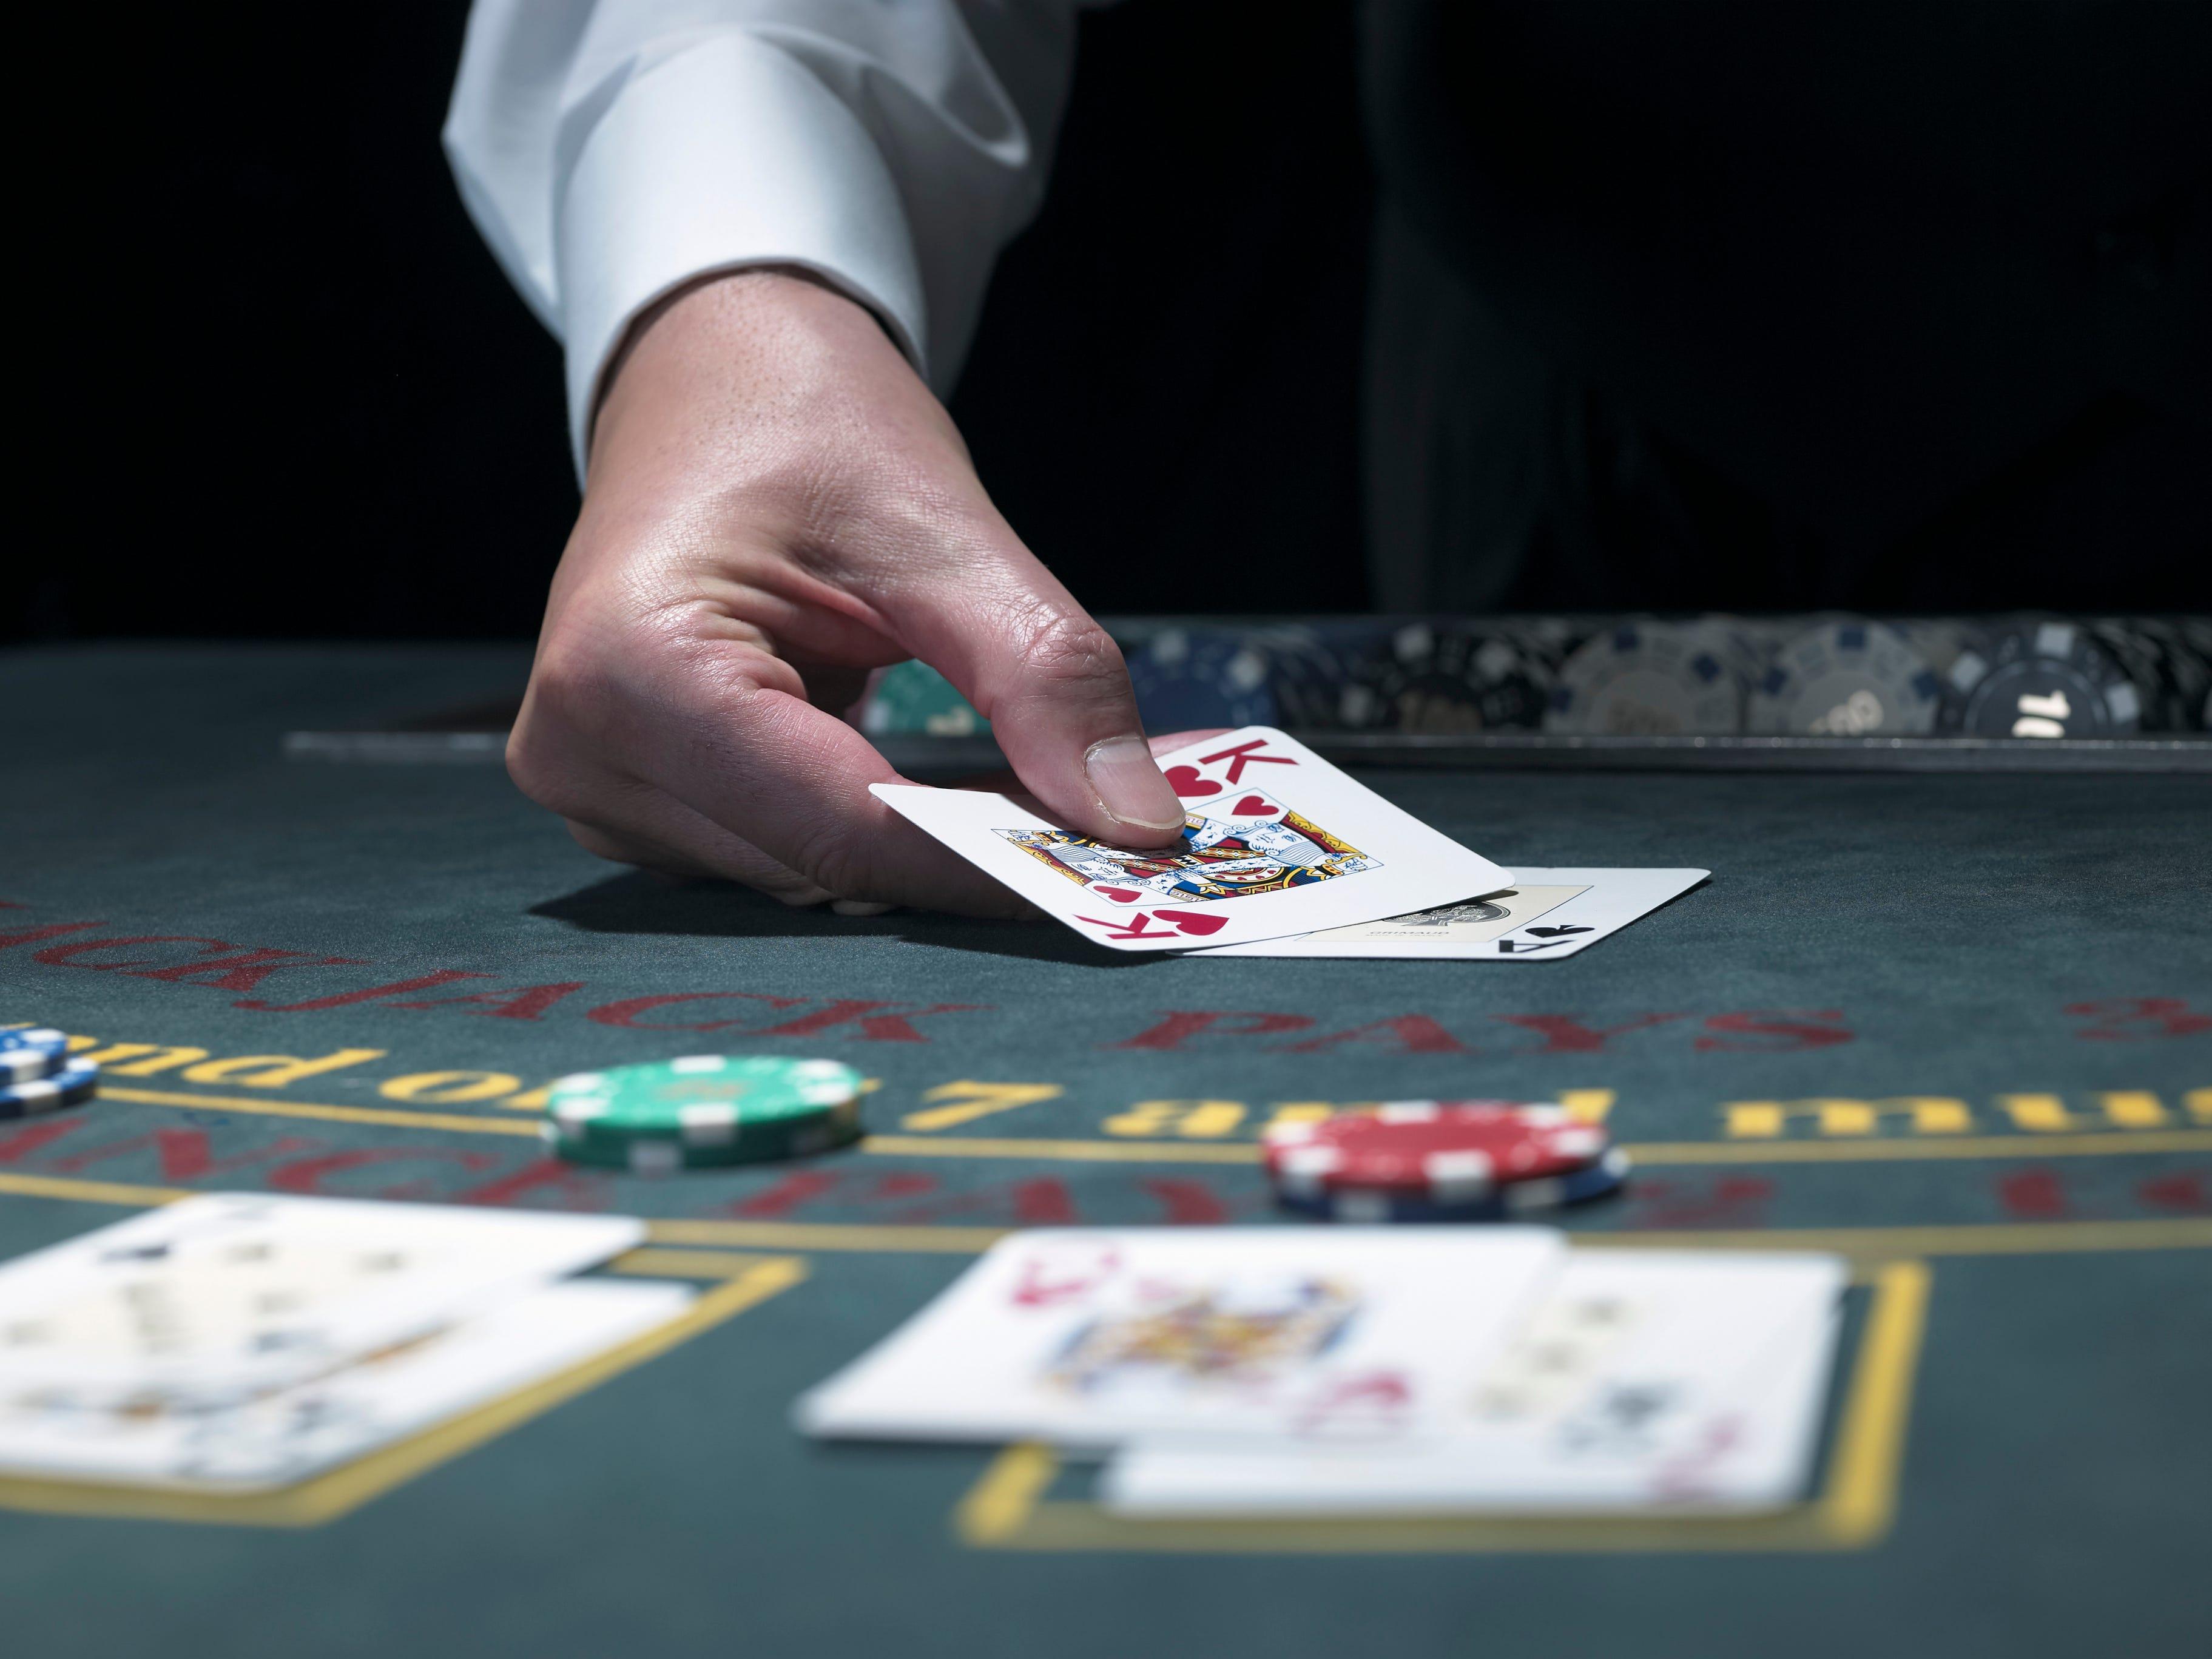 Vg je bois poker